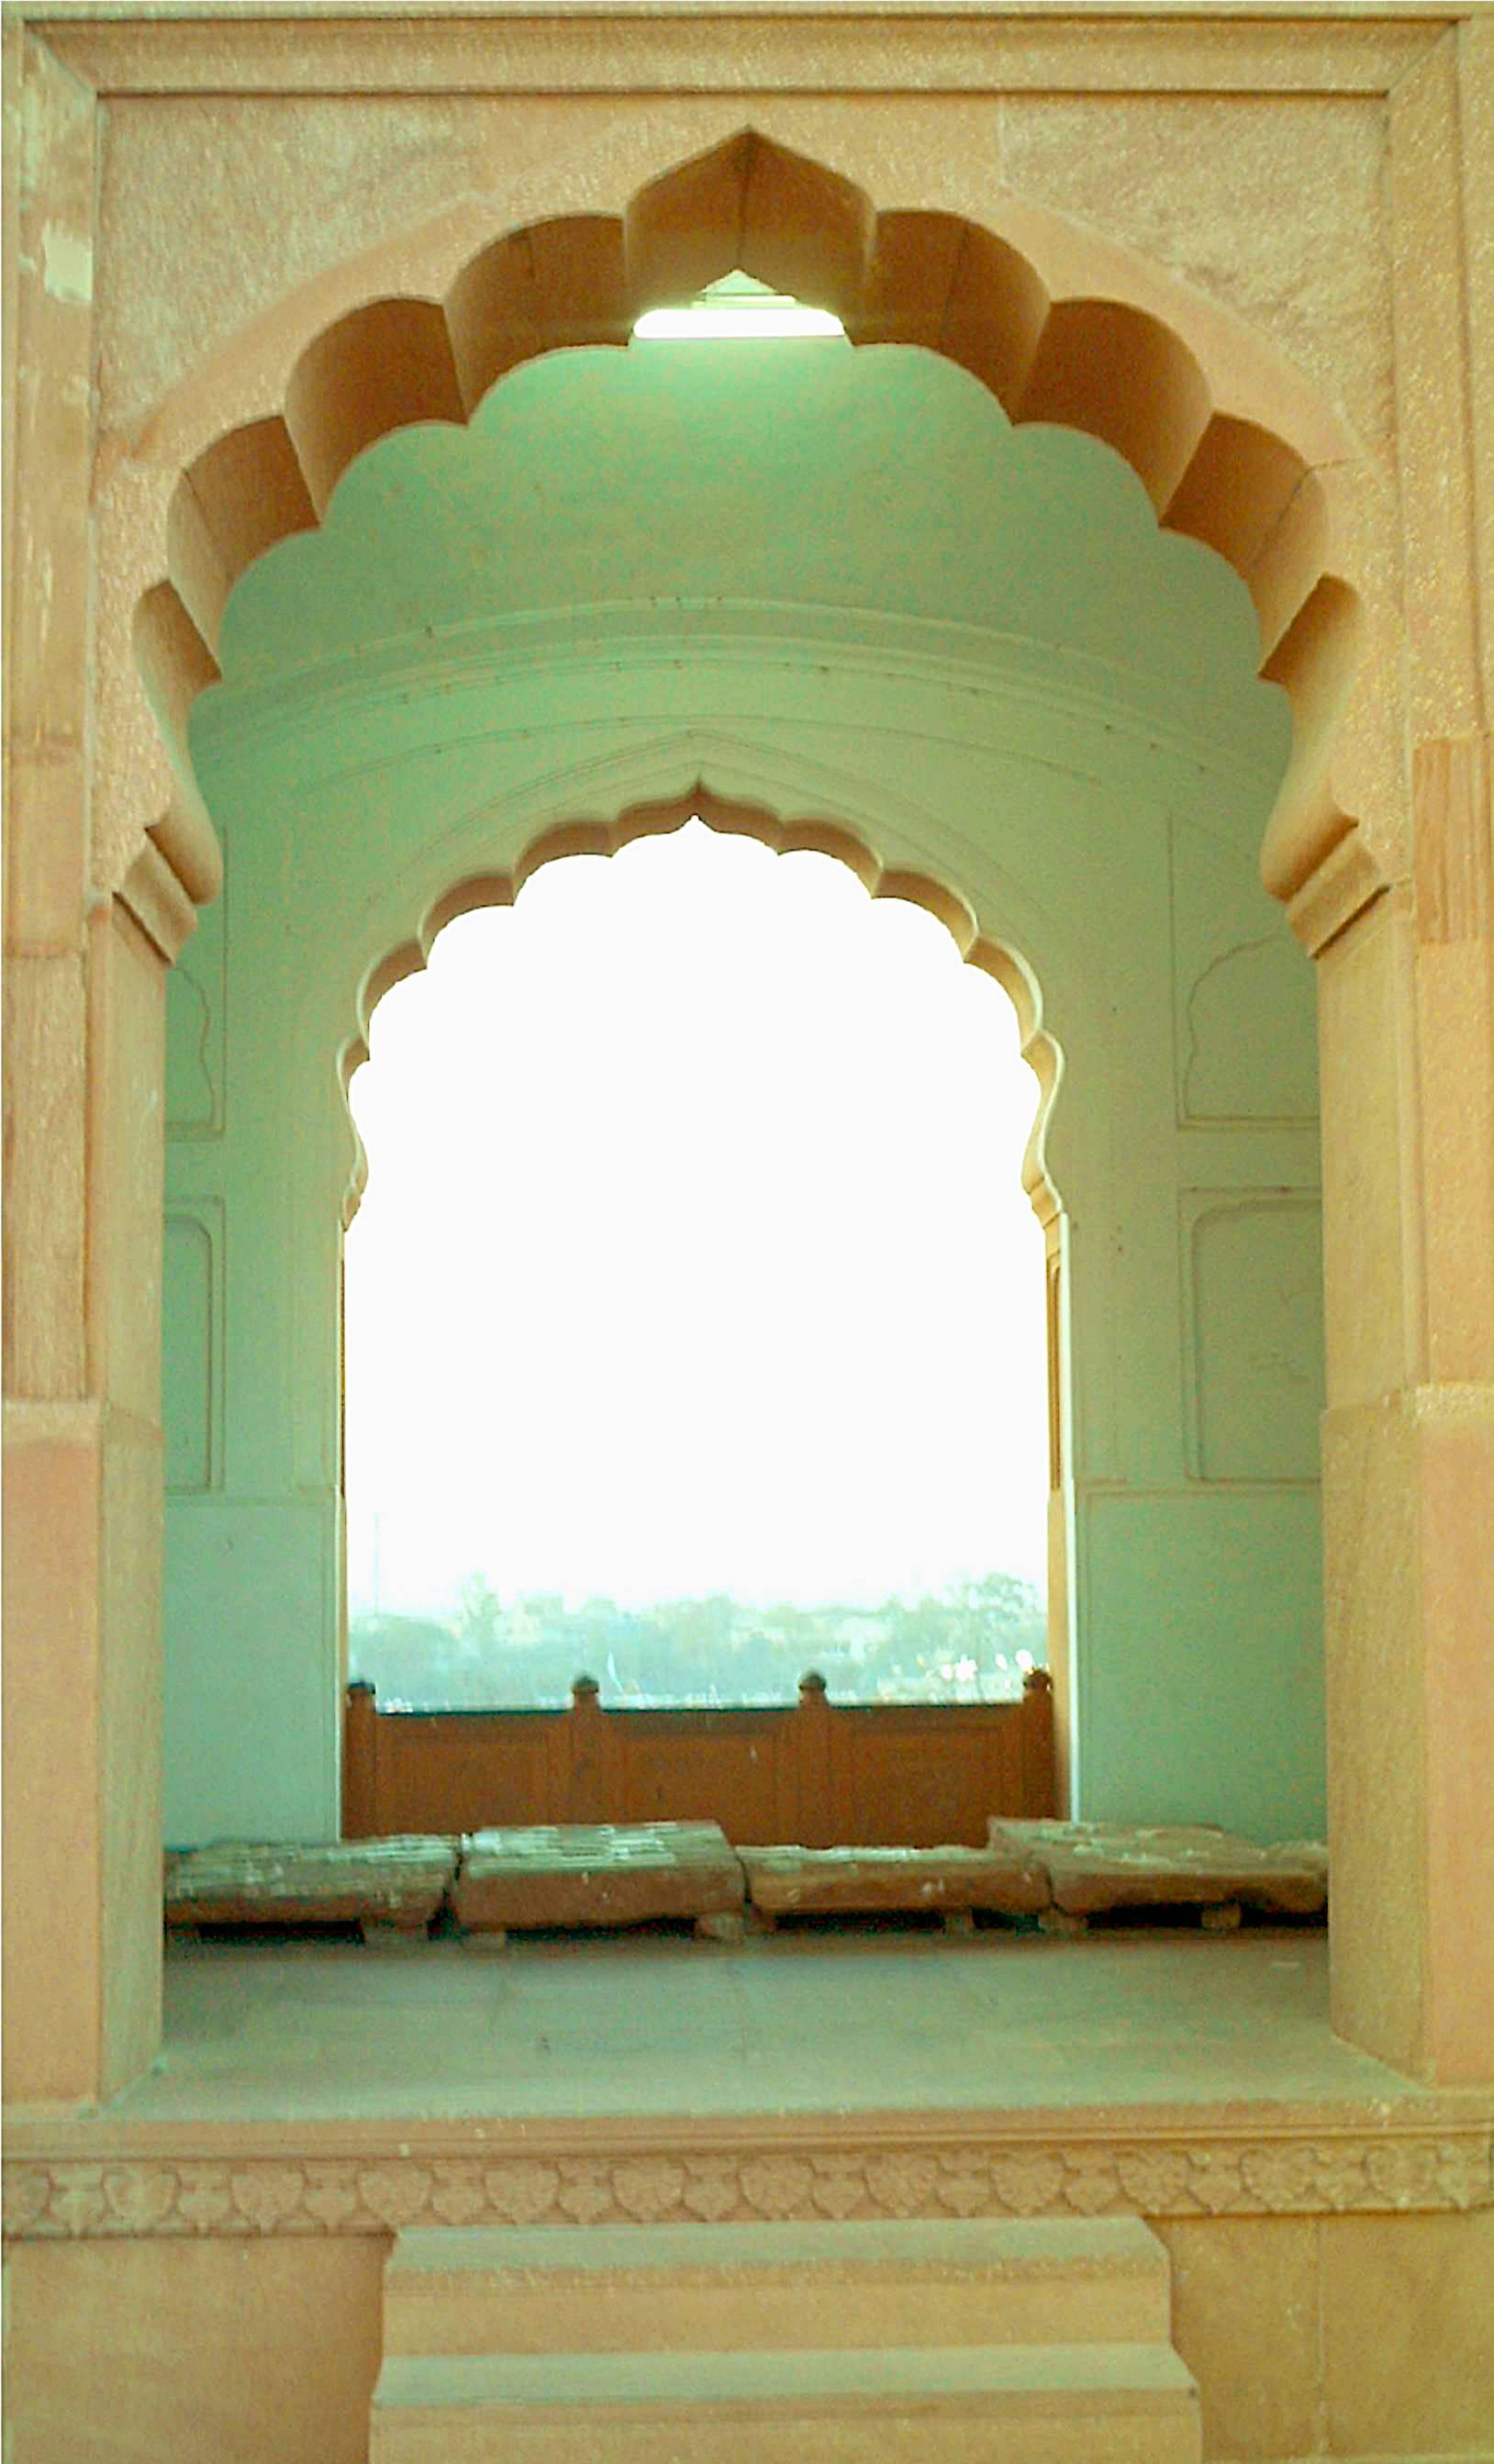 Jharokha overlooking Iqbal Park (venue of the Lahore Resolution) from Aurangzeb's Badshahi mosque